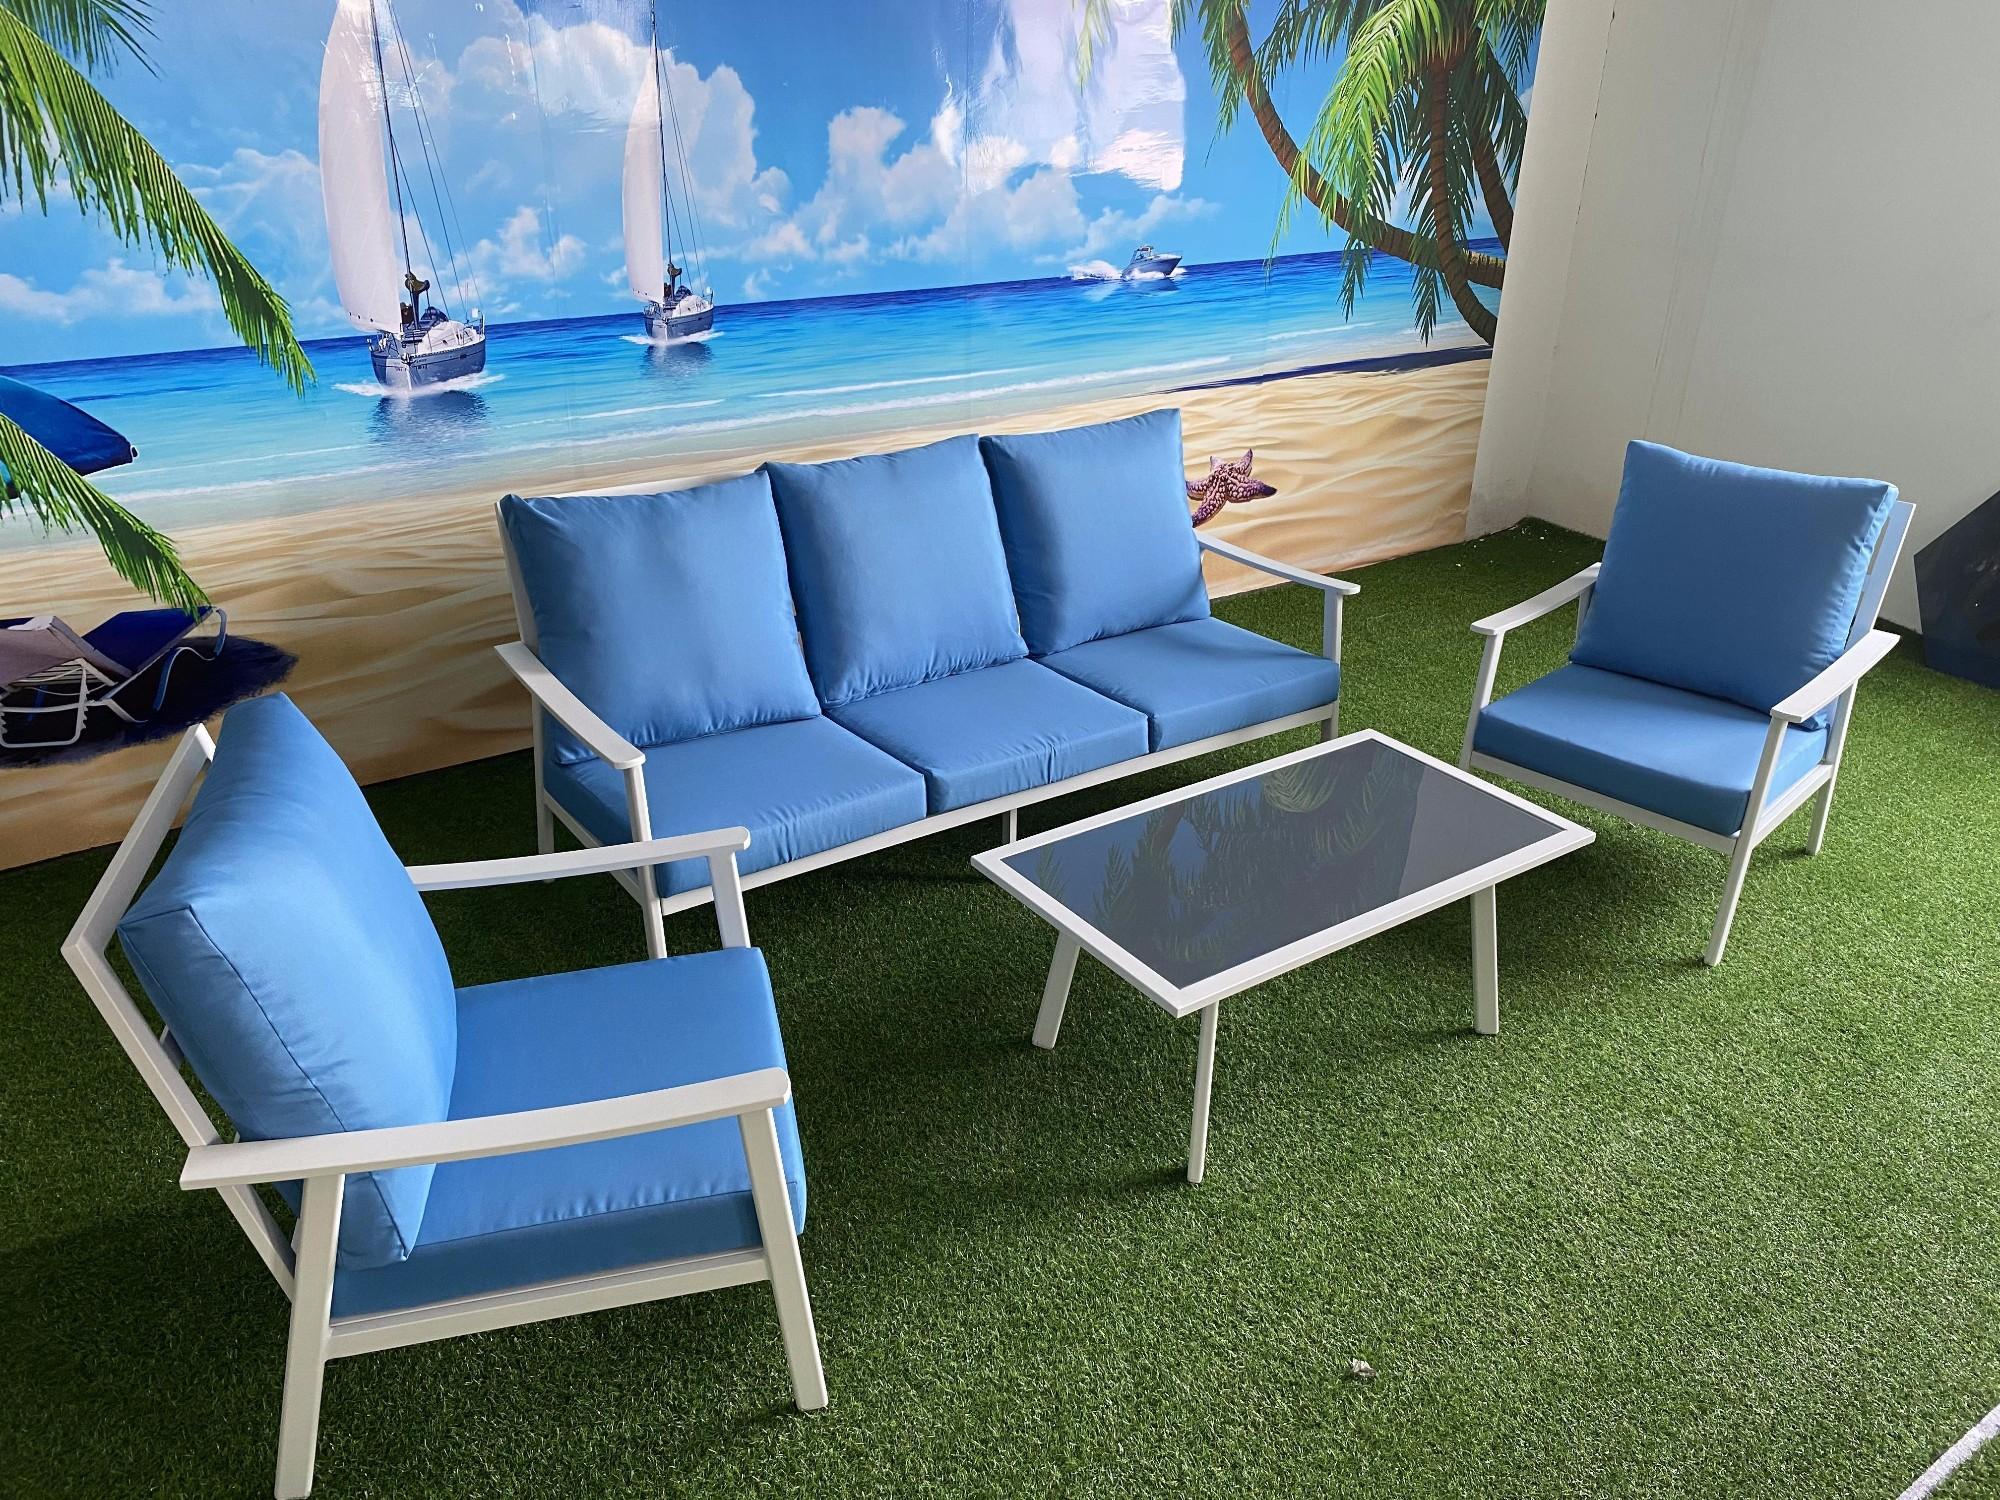 Outdoor Aluminium Garden Sofa Furniture Manufacturers, Outdoor Aluminium Garden Sofa Furniture Factory, Supply Outdoor Aluminium Garden Sofa Furniture